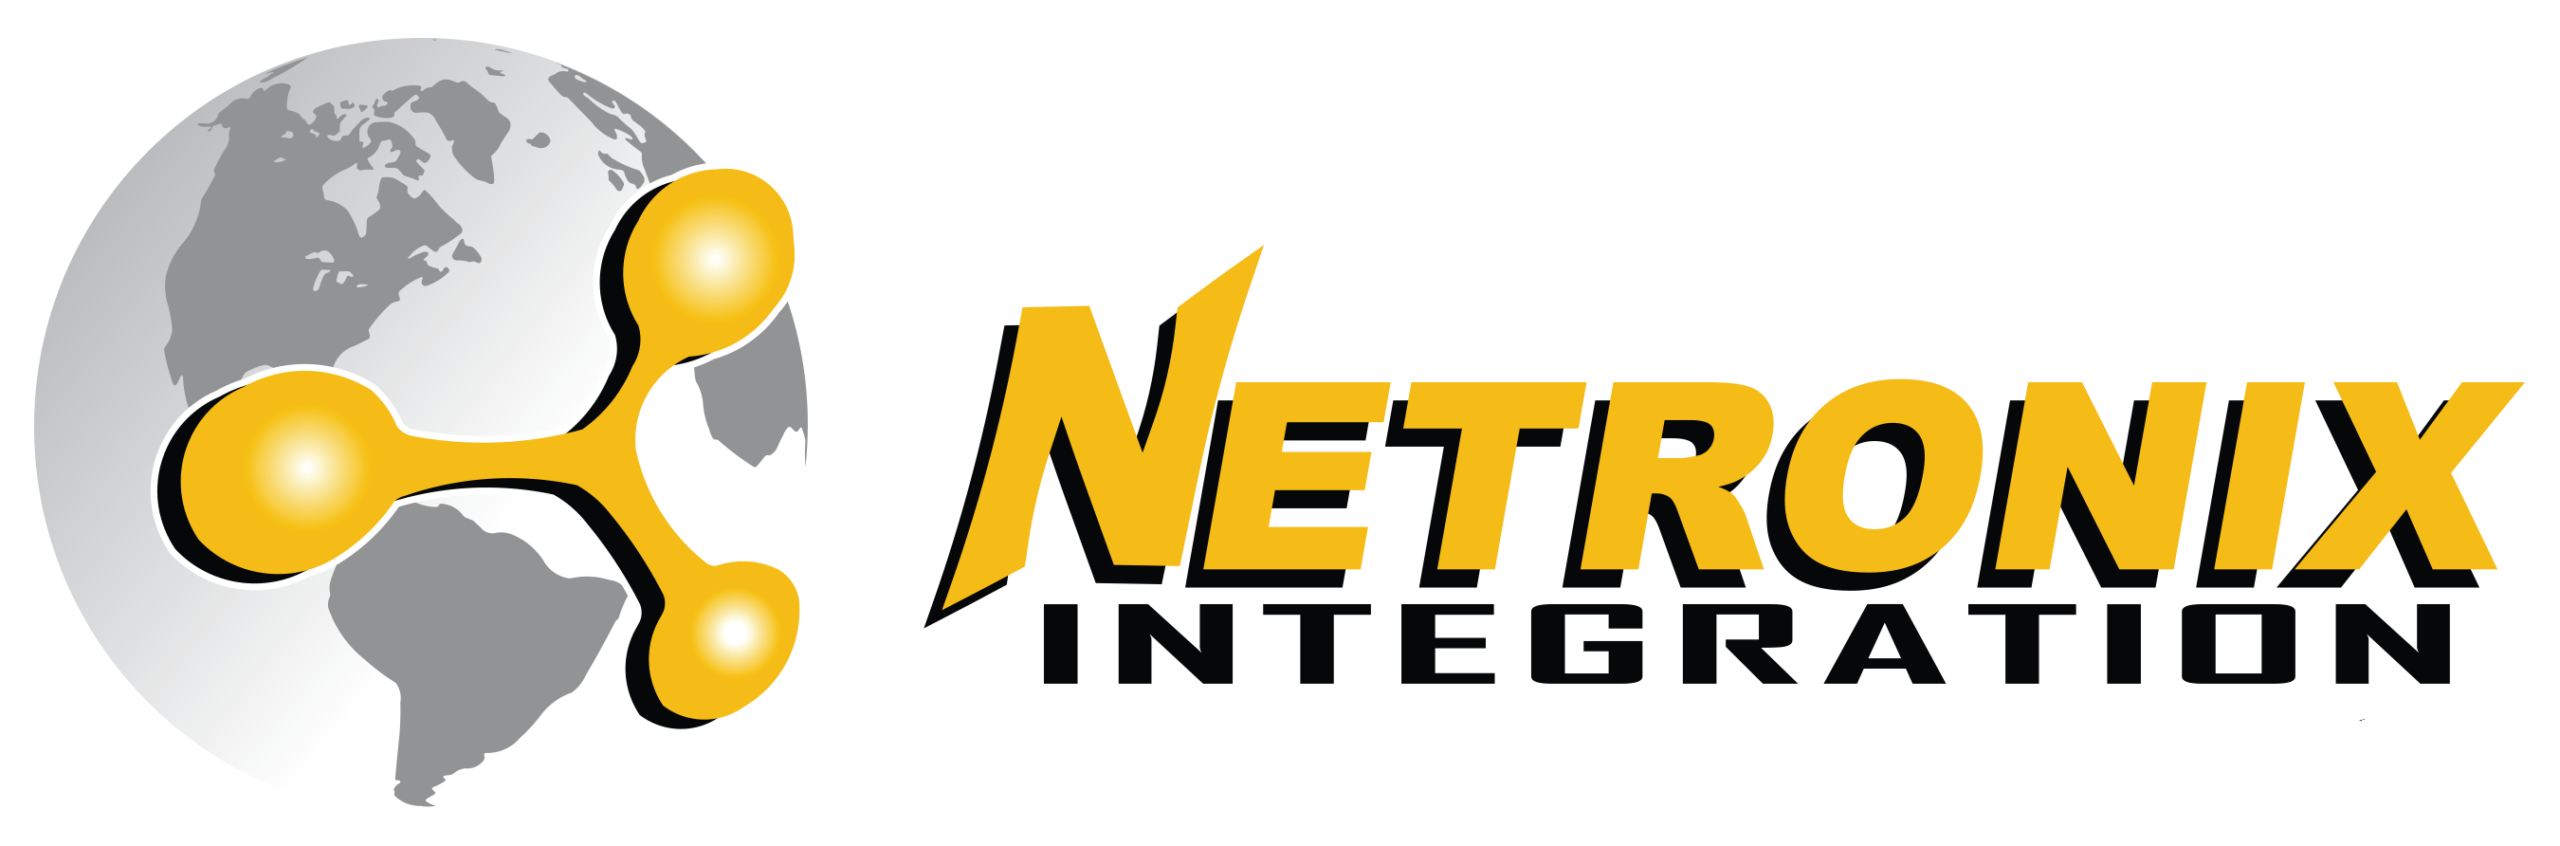 NetronixLogoGlobal_enterprise